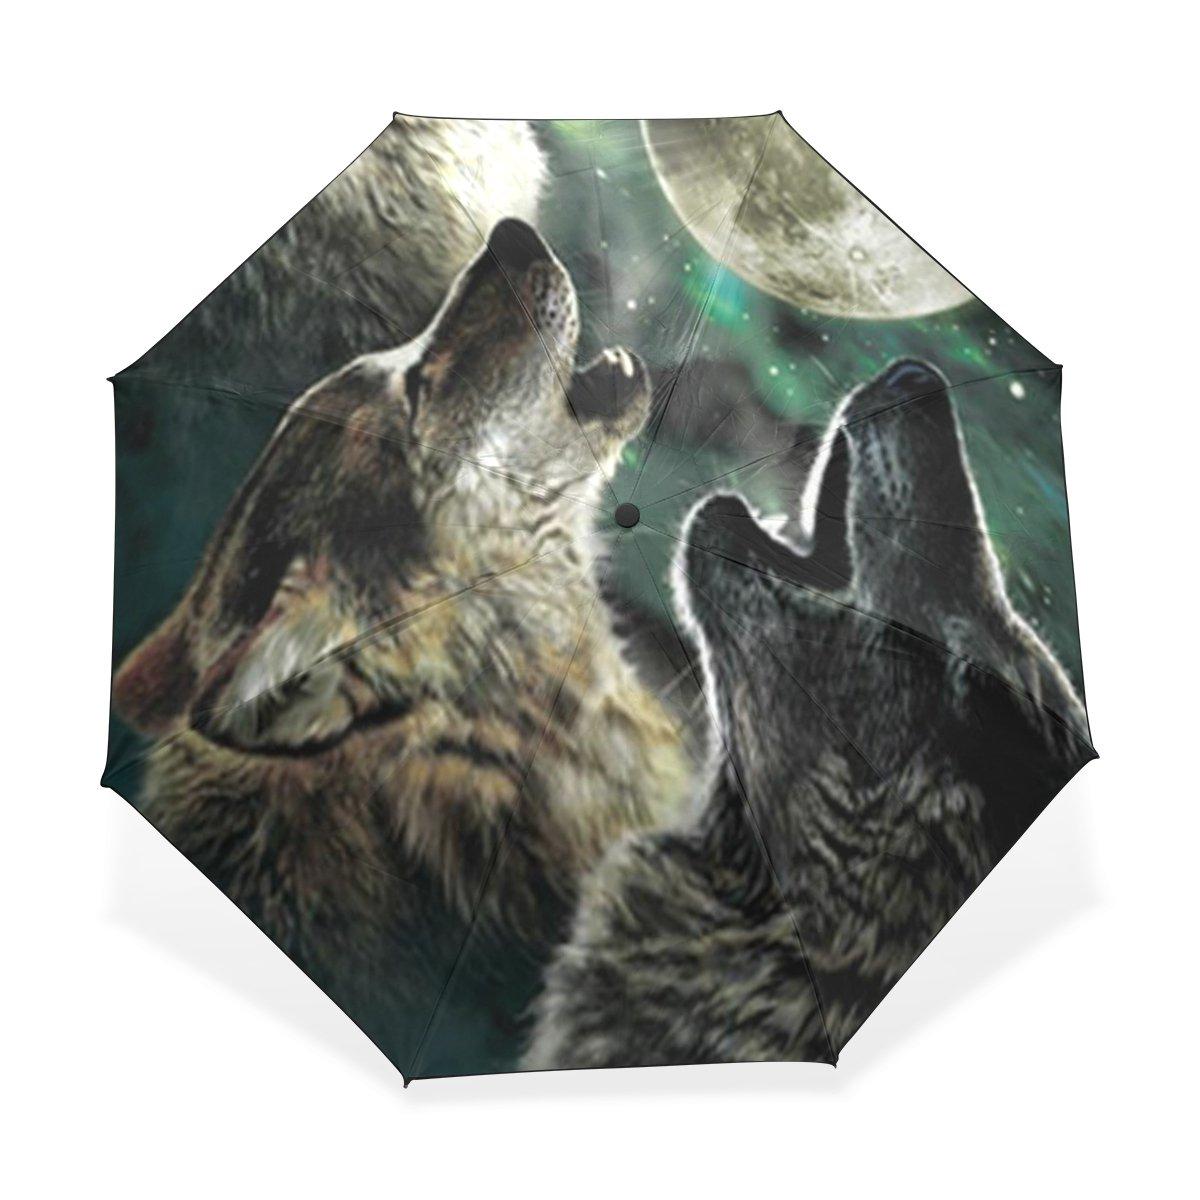 JSTEL Wolf Pattern Windproof & Waterproof Compact Travel Umbrella Anti-UV Protective Canopy Parasol UPF 50+ Sun Block Umbrella Summer Shady Folding Sun Umbrella